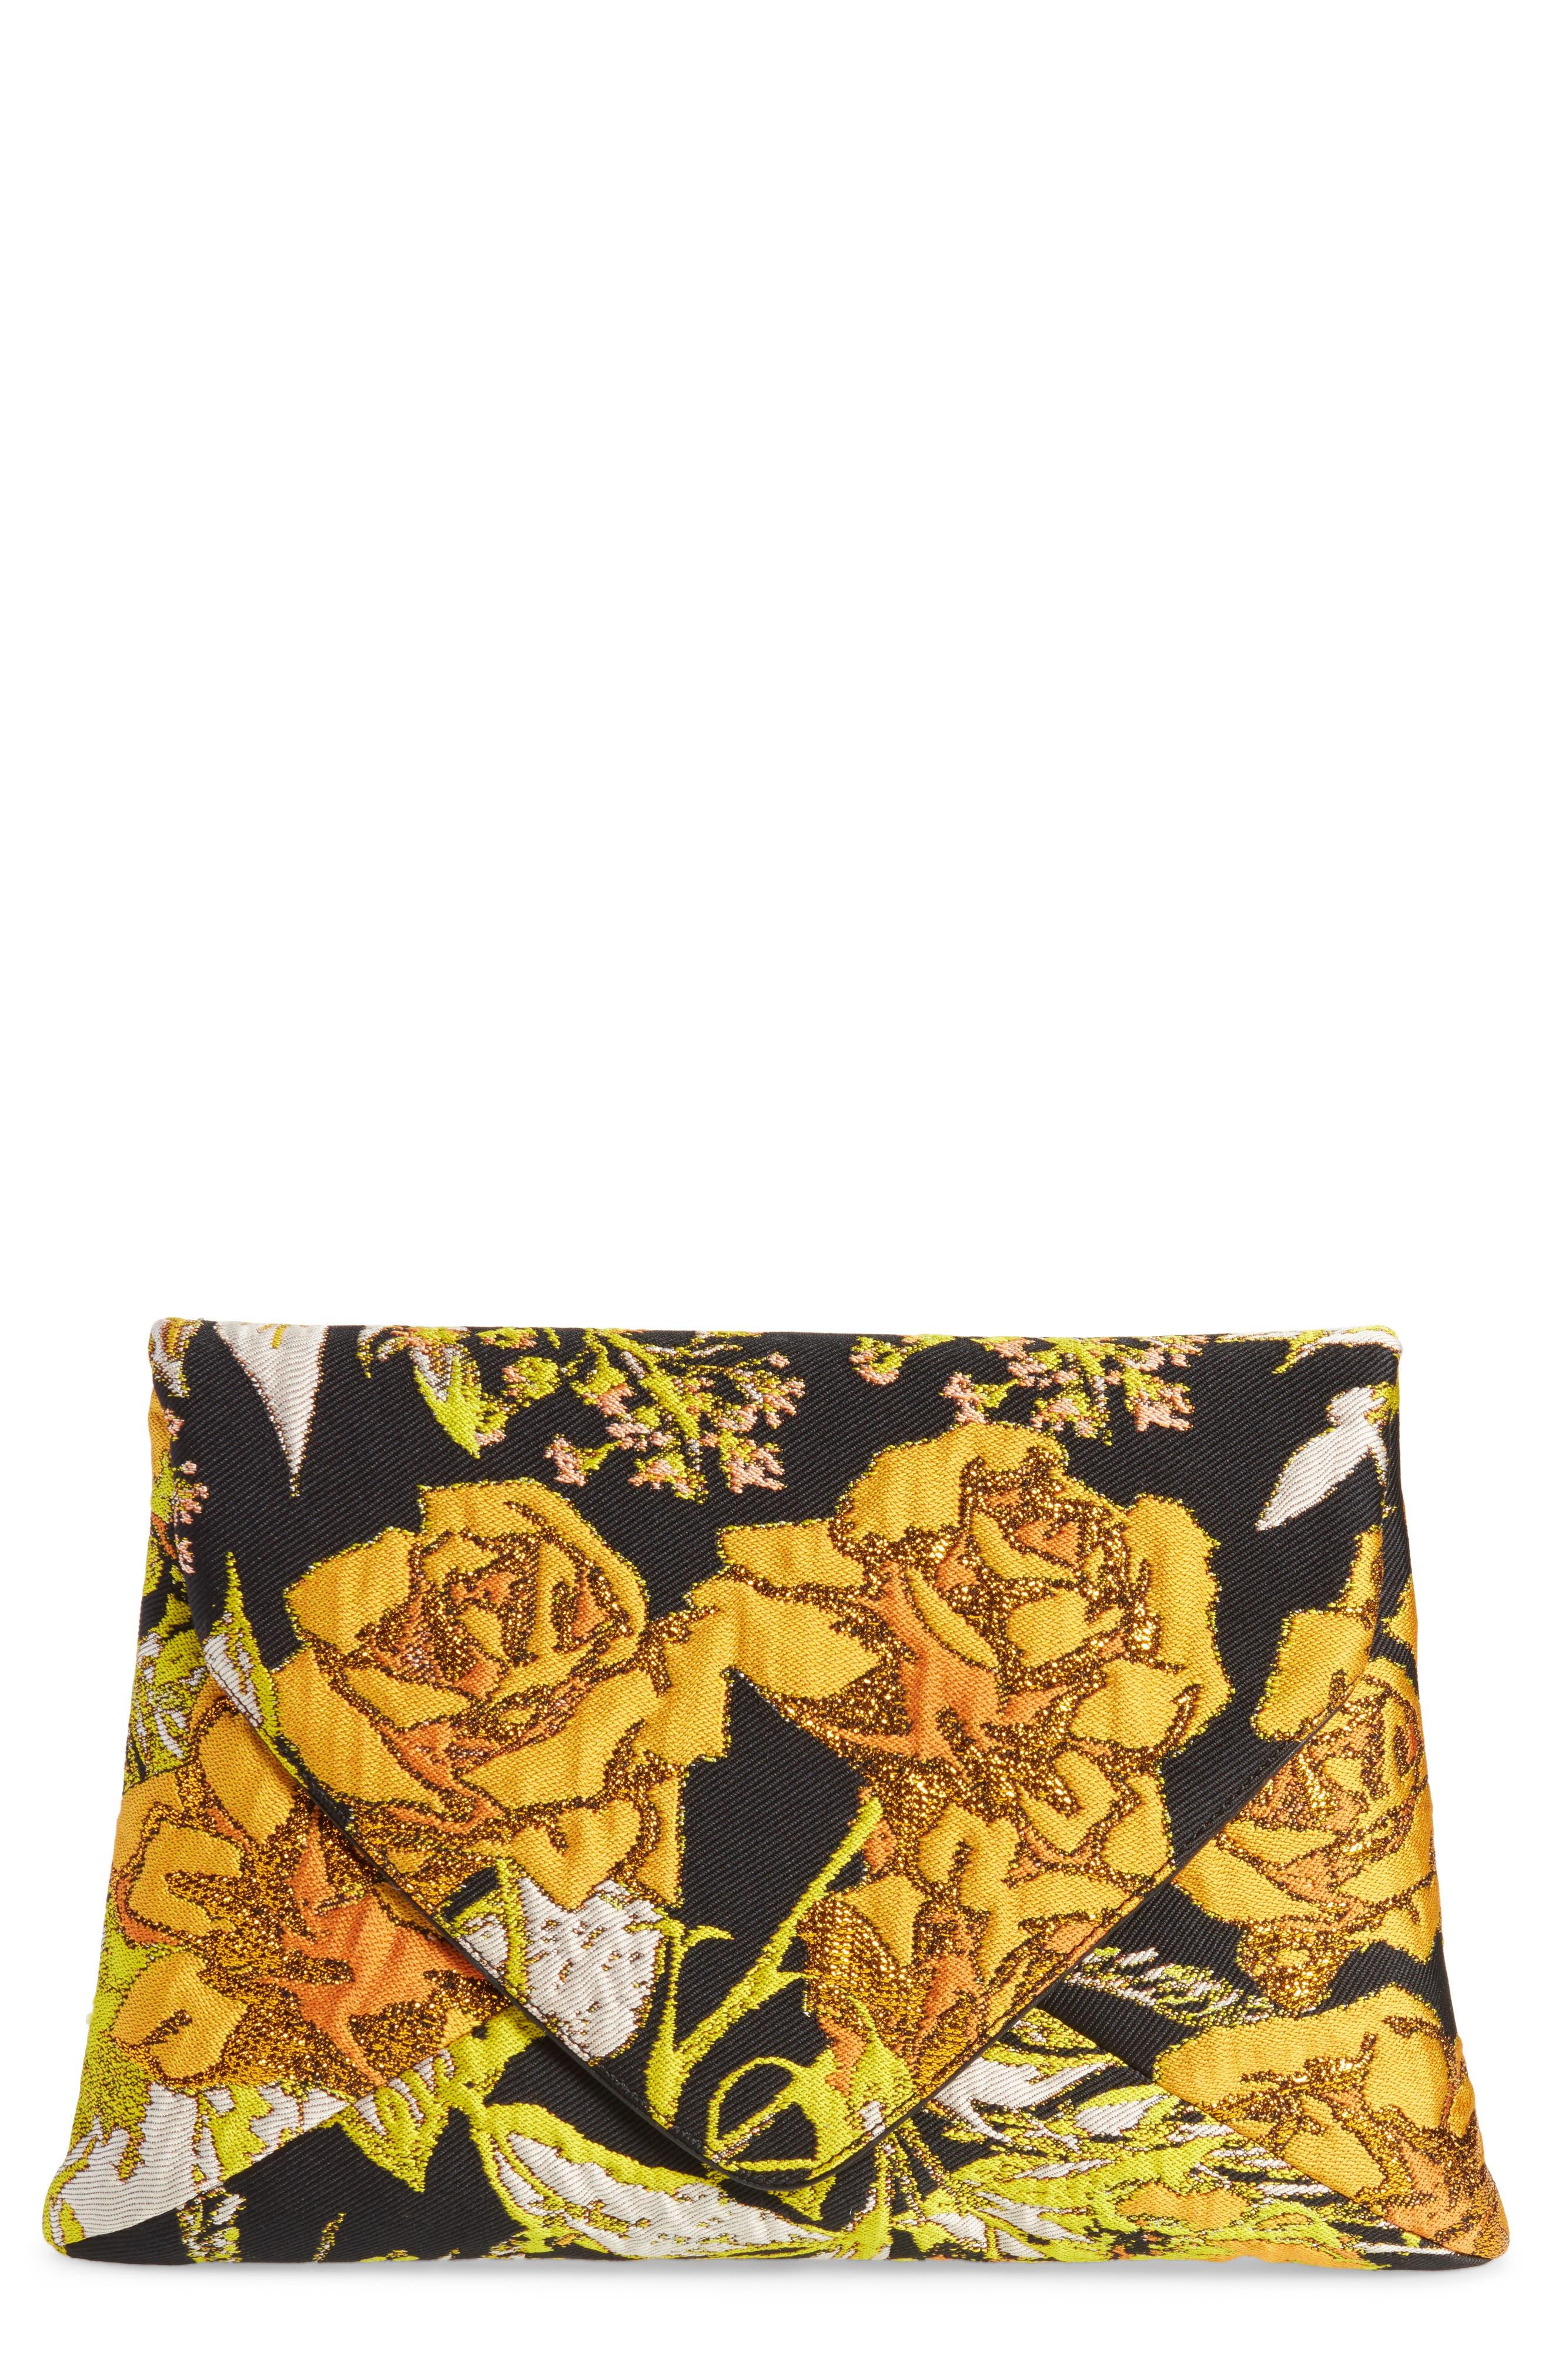 Alternate Image 1 Selected - Dries Van Noten Floral Jacquard Envelope Clutch